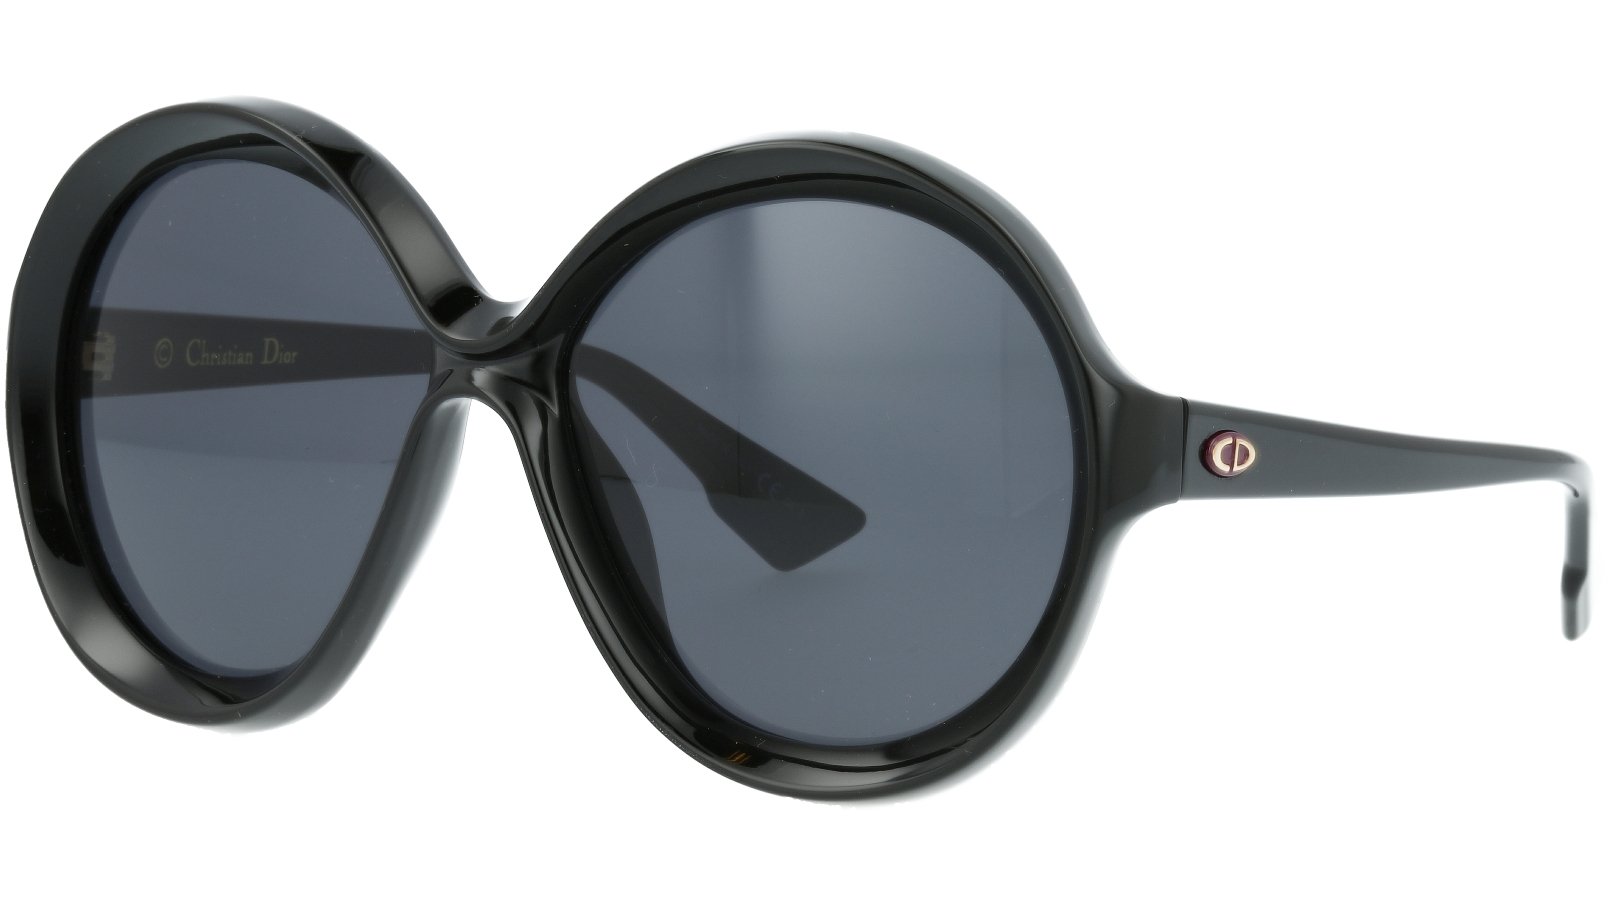 Dior BIANCA PJPKU 58 Blue Sunglasses